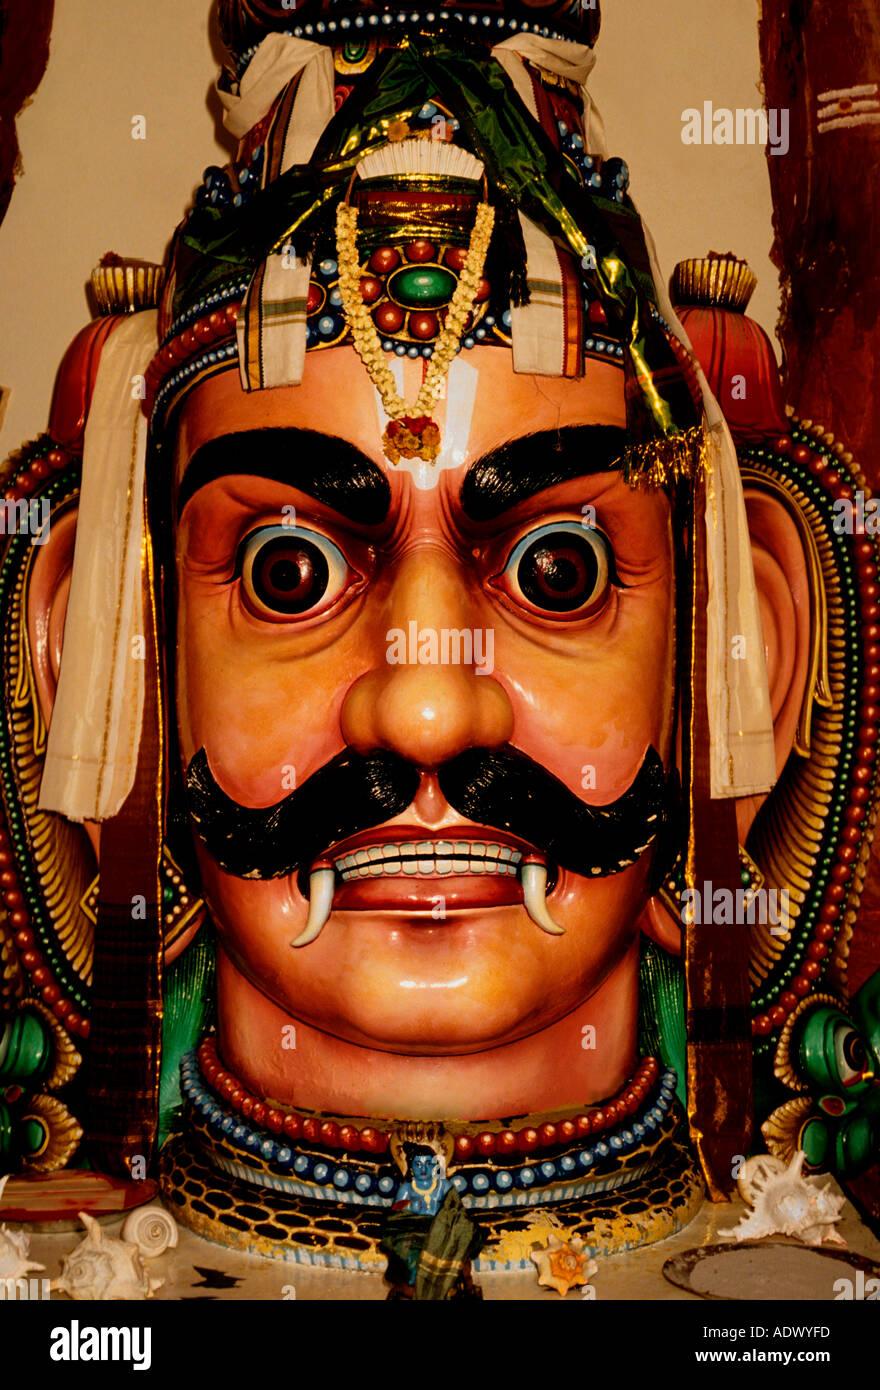 Hindu deity, Sri Mariamman Temple, Sri Mariamman, Hindu Temple, Hinduism, temple, Singapore, Southeast Asia - Stock Image